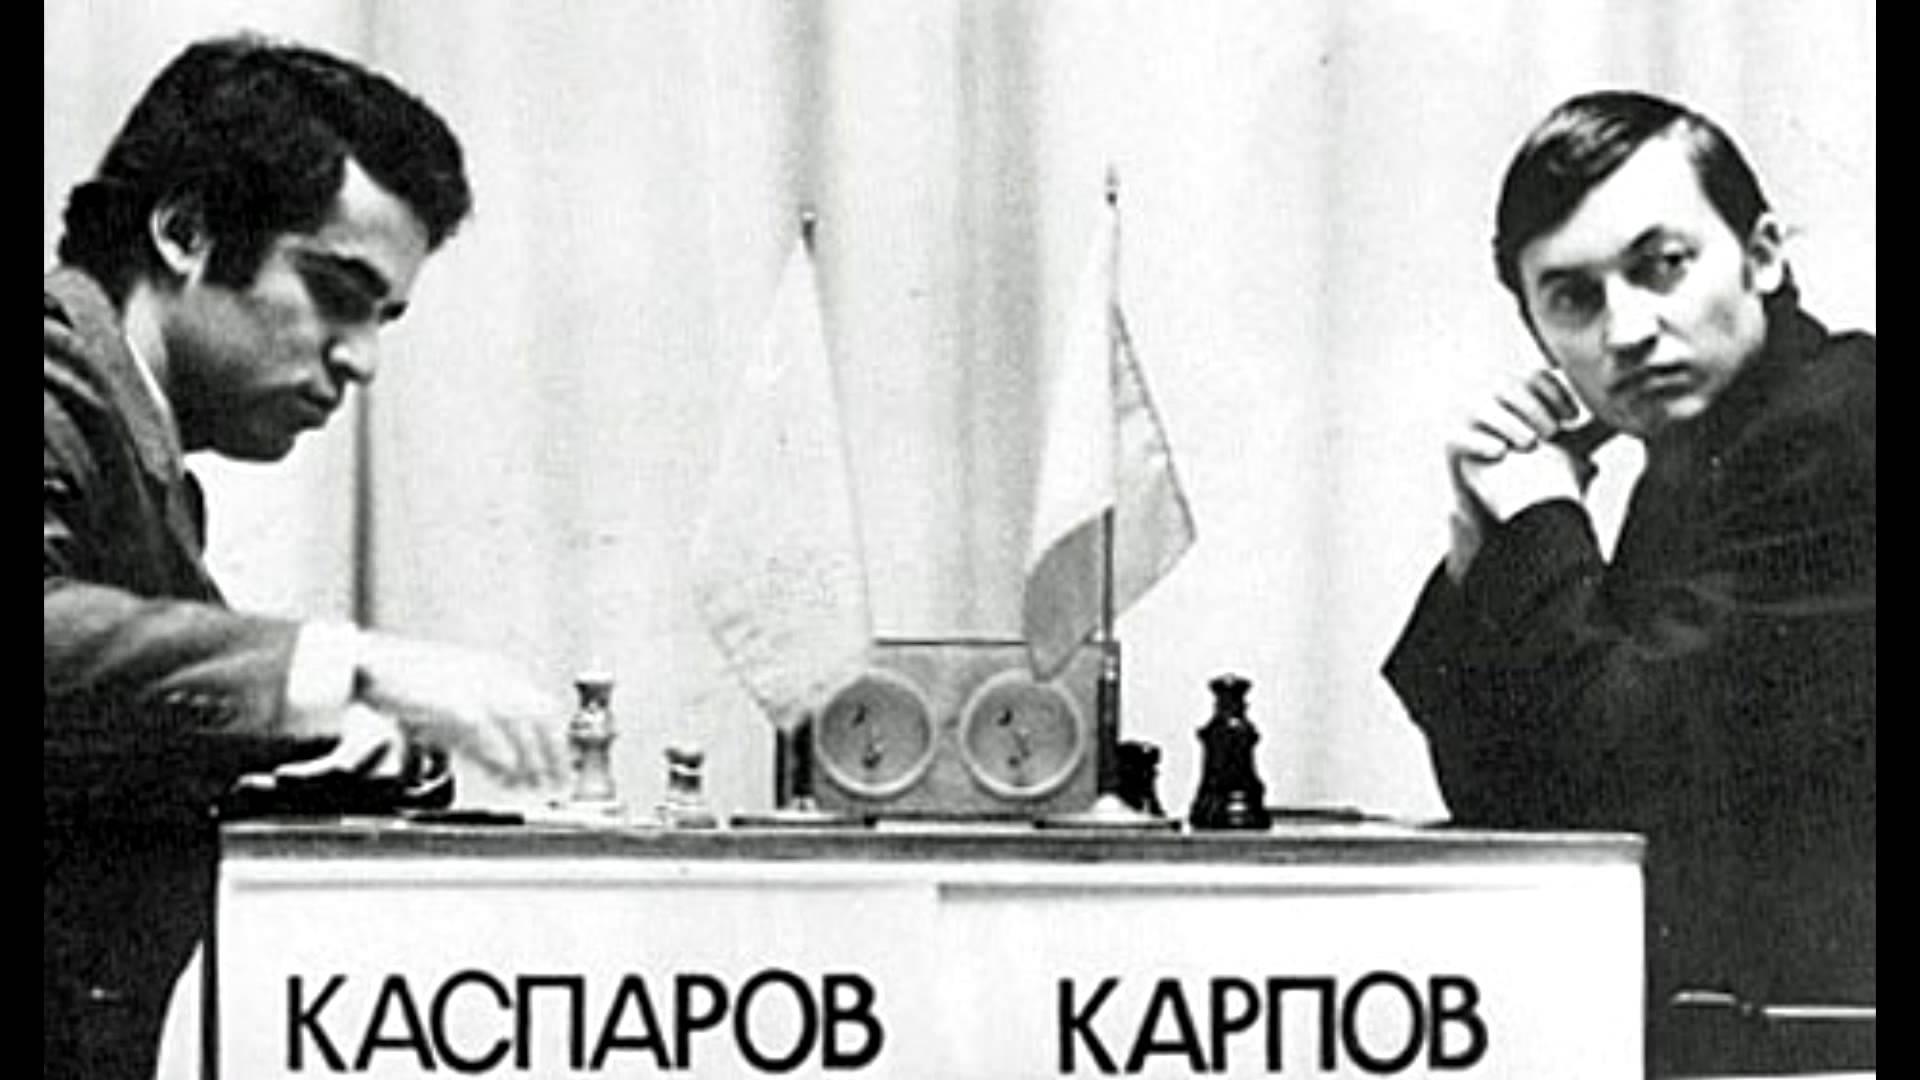 Karpv vs Kasparov